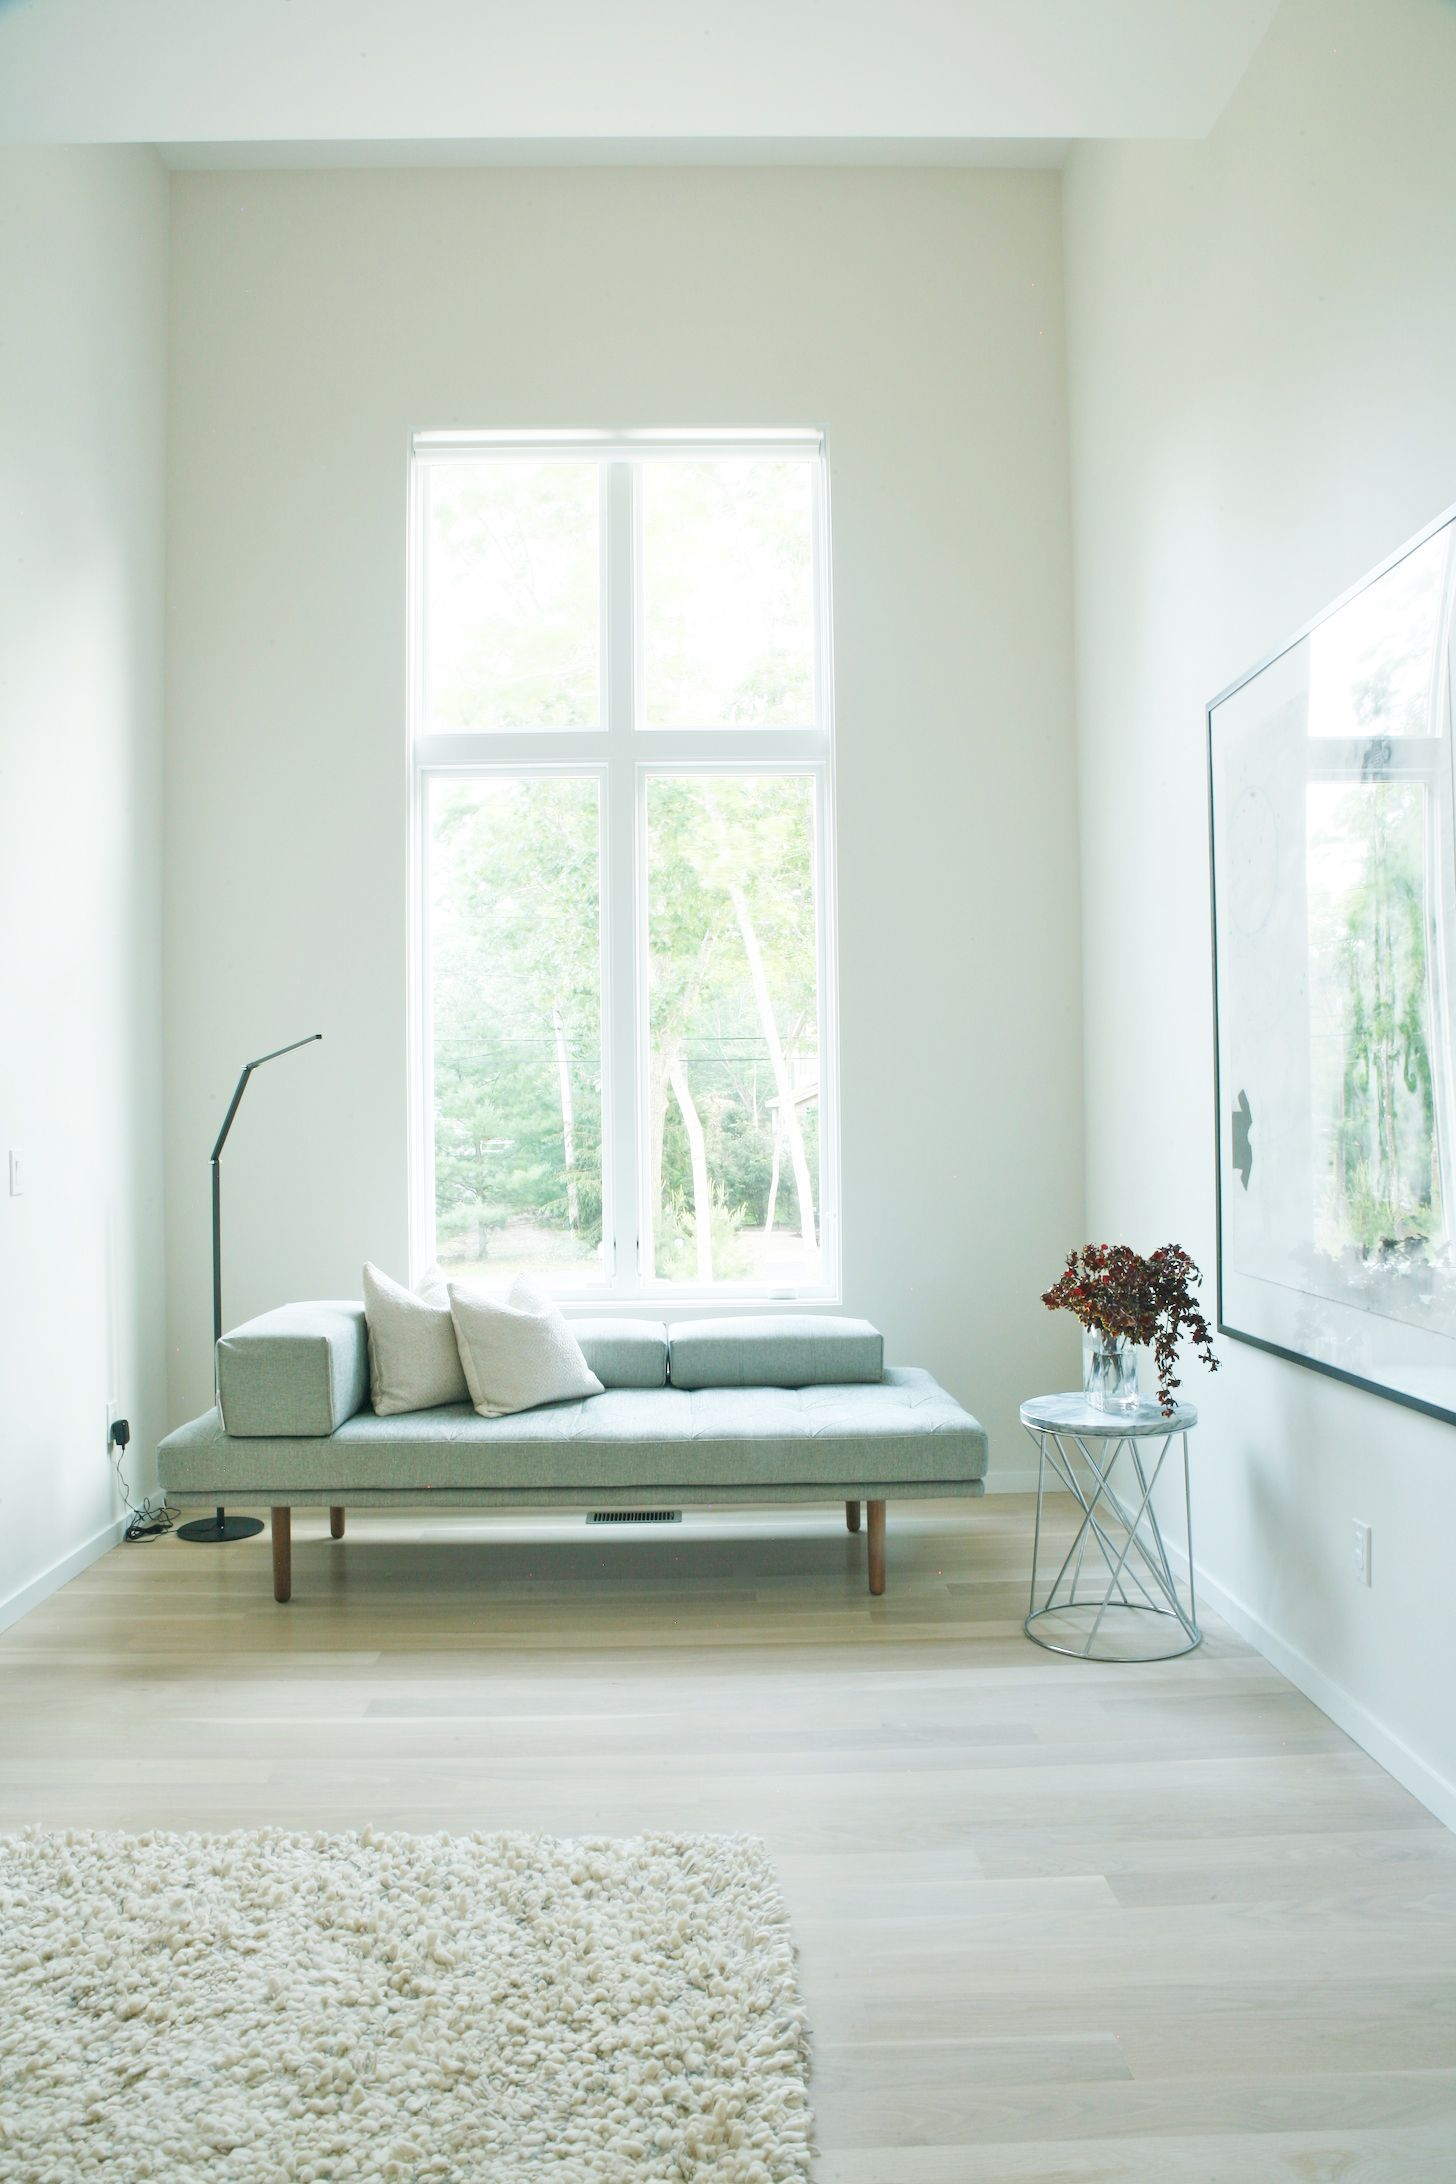 Interior design solution for a bedroom east hampton second home